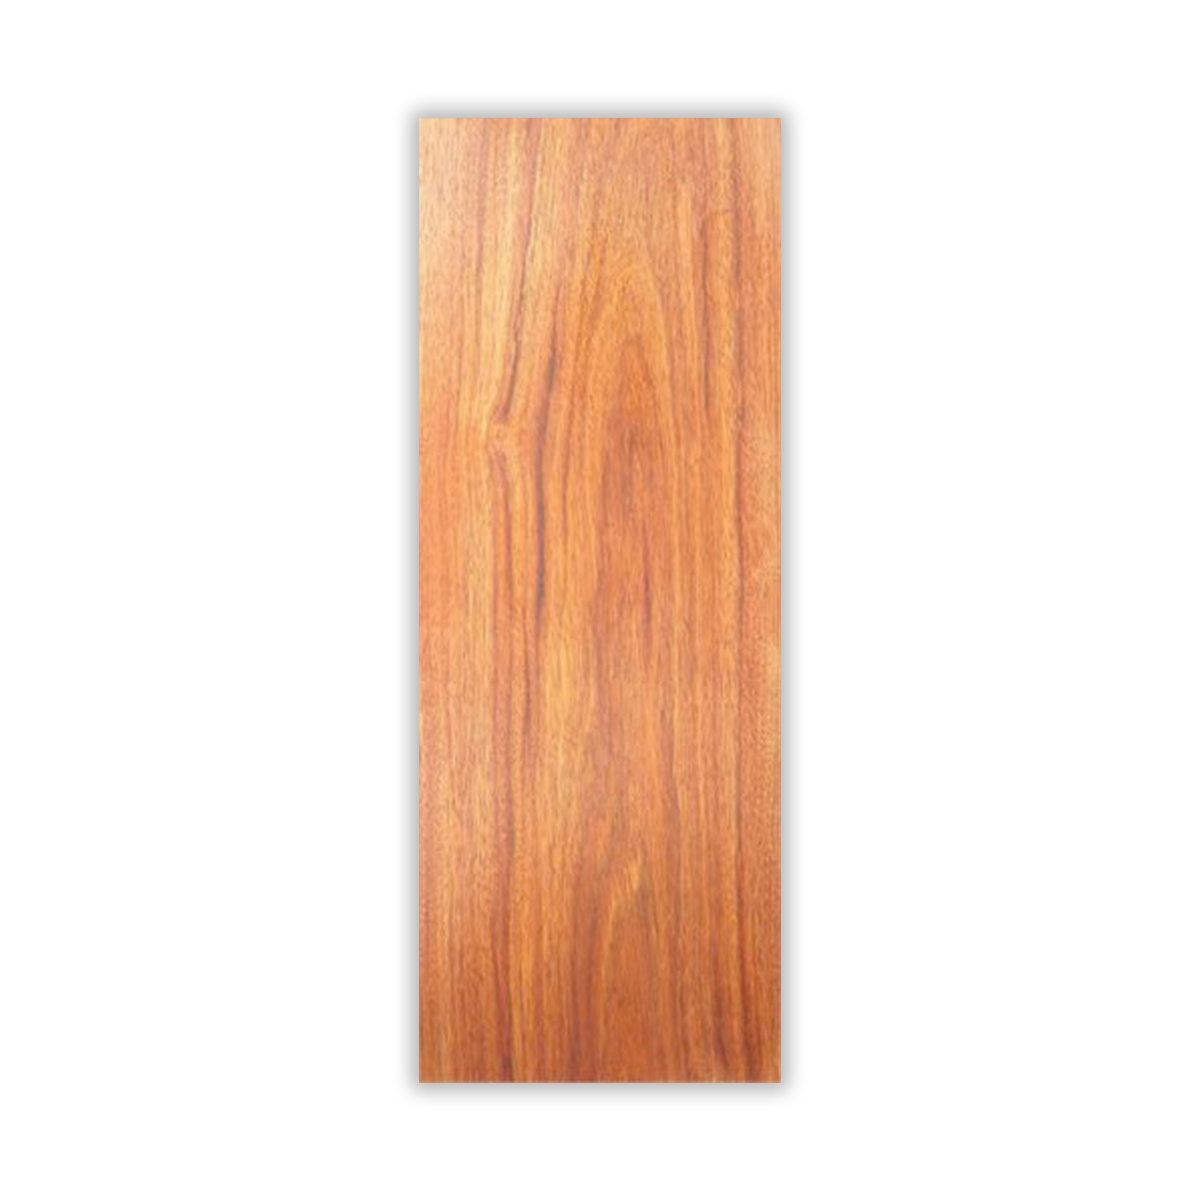 beech wood.png